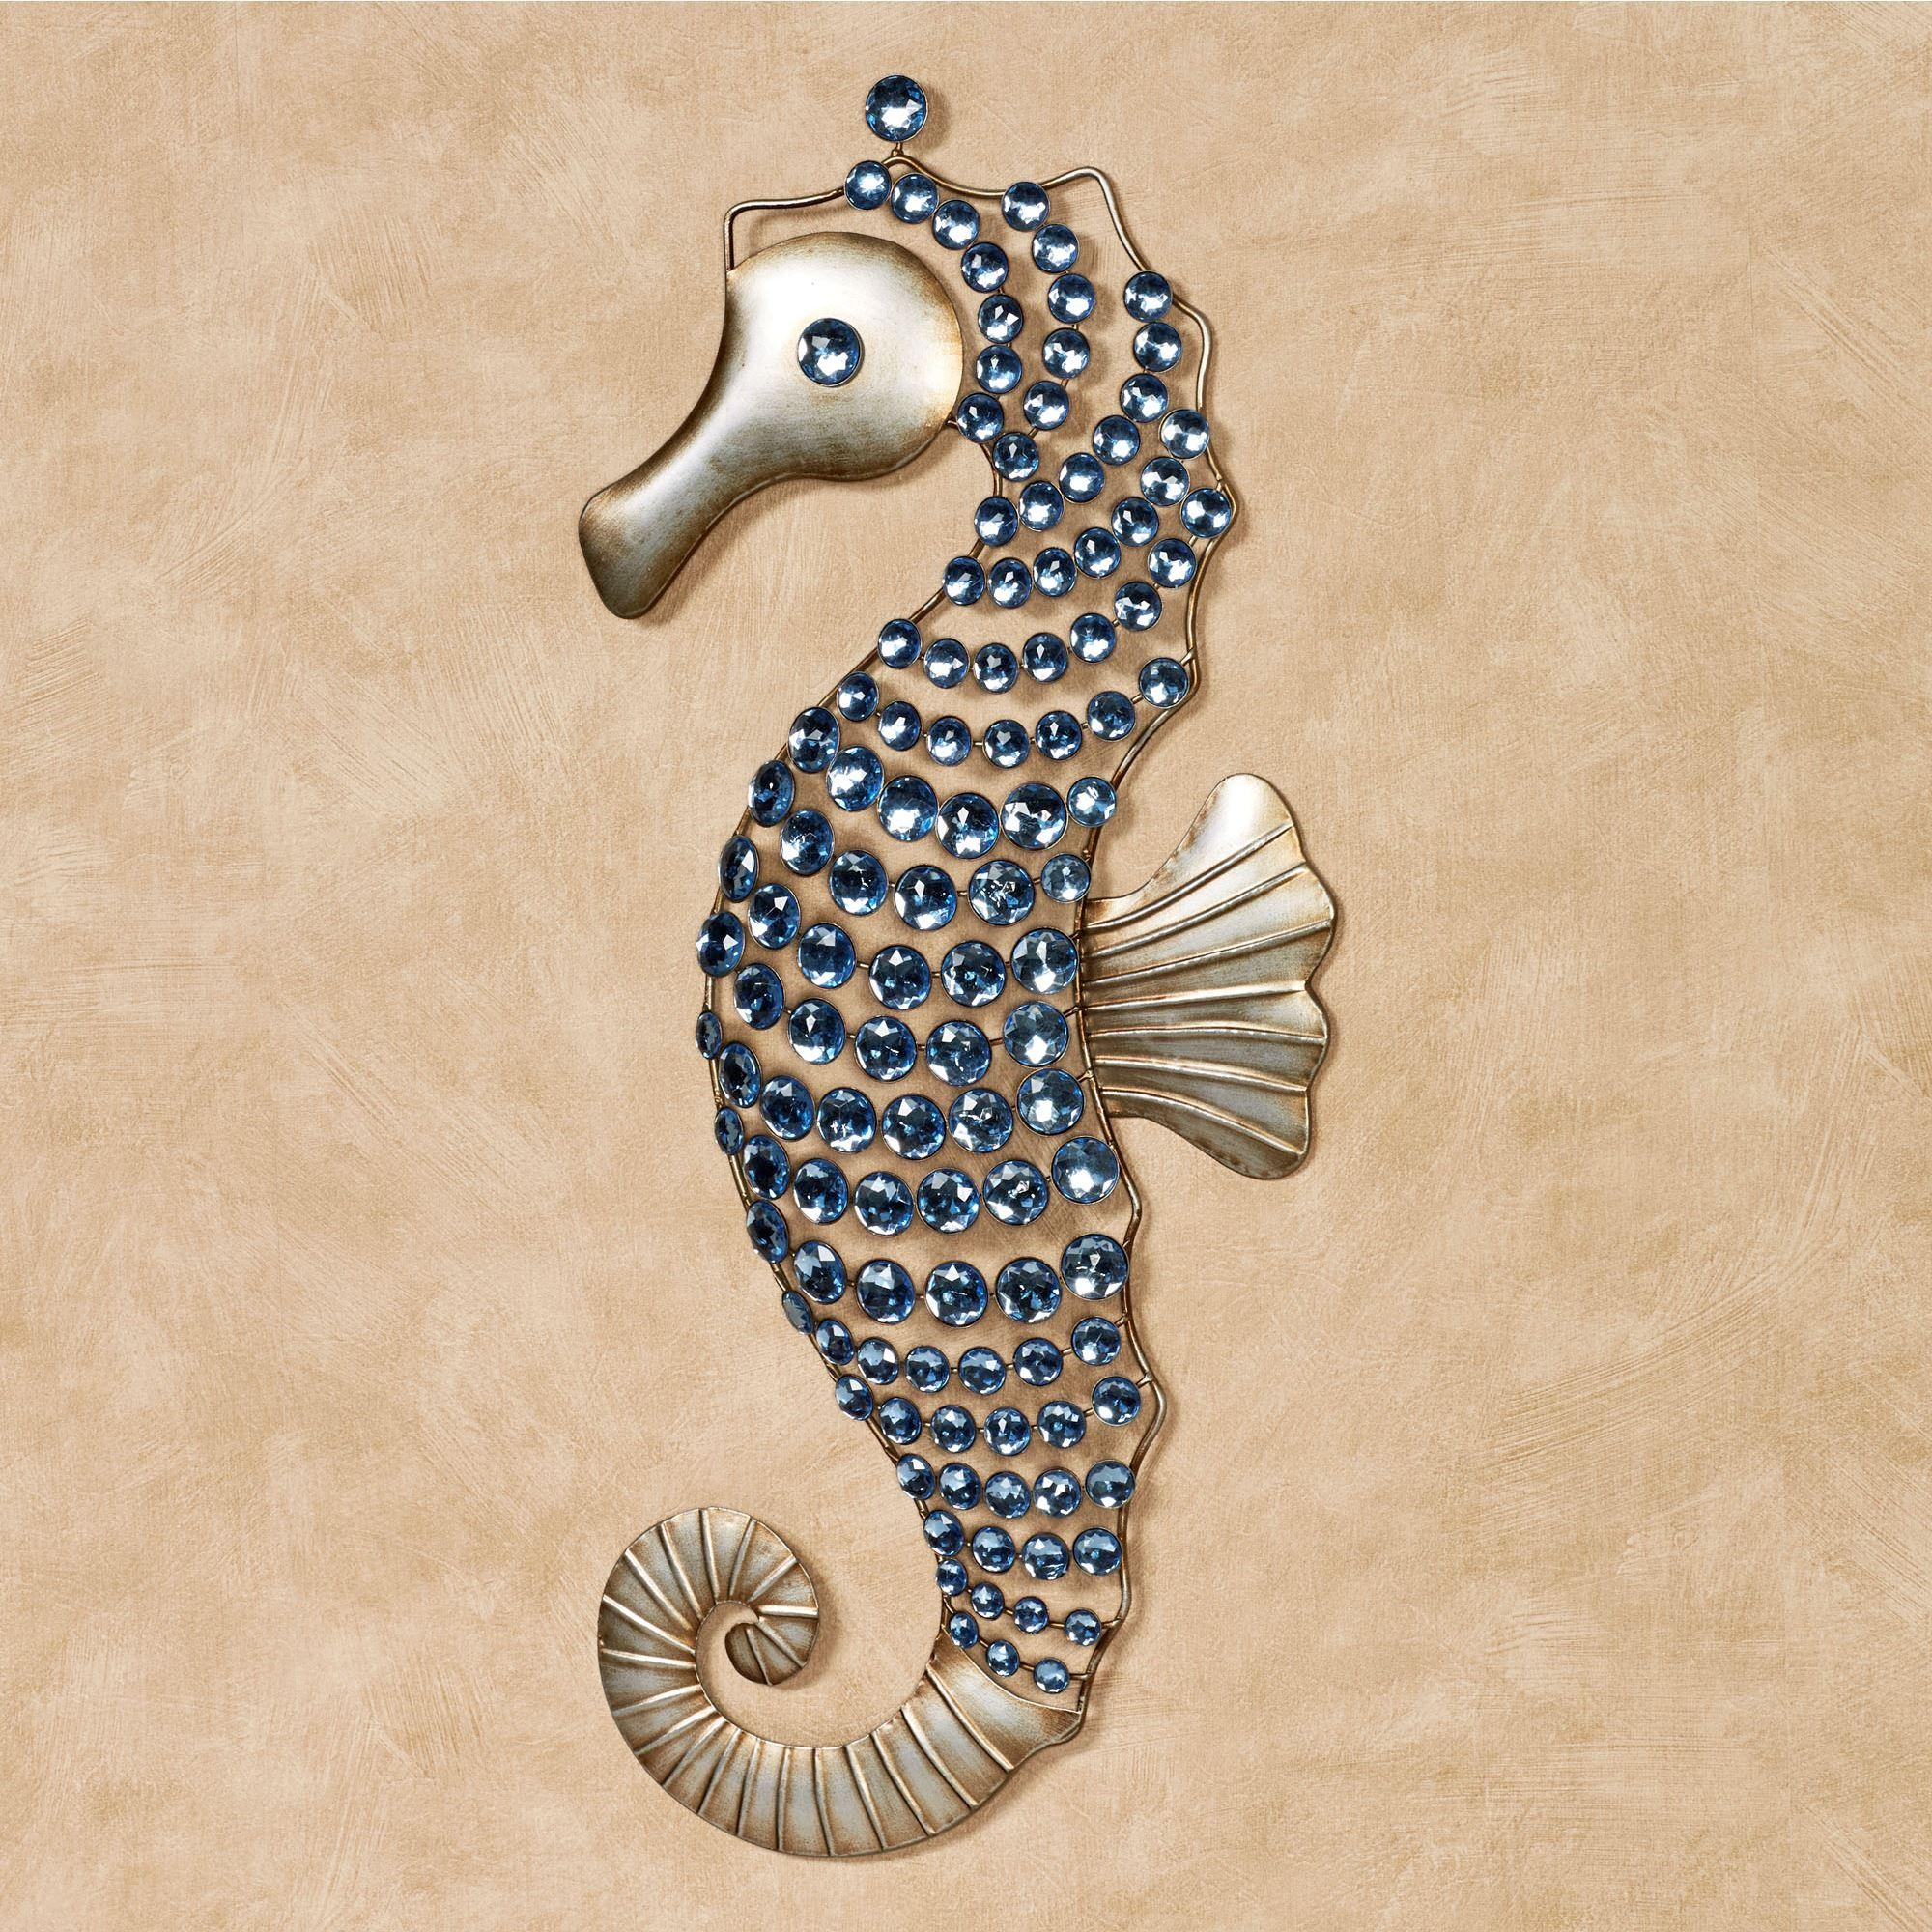 Seahorse Gems Metal Wall Art Regarding Sea Horse Wall Art (View 6 of 20)